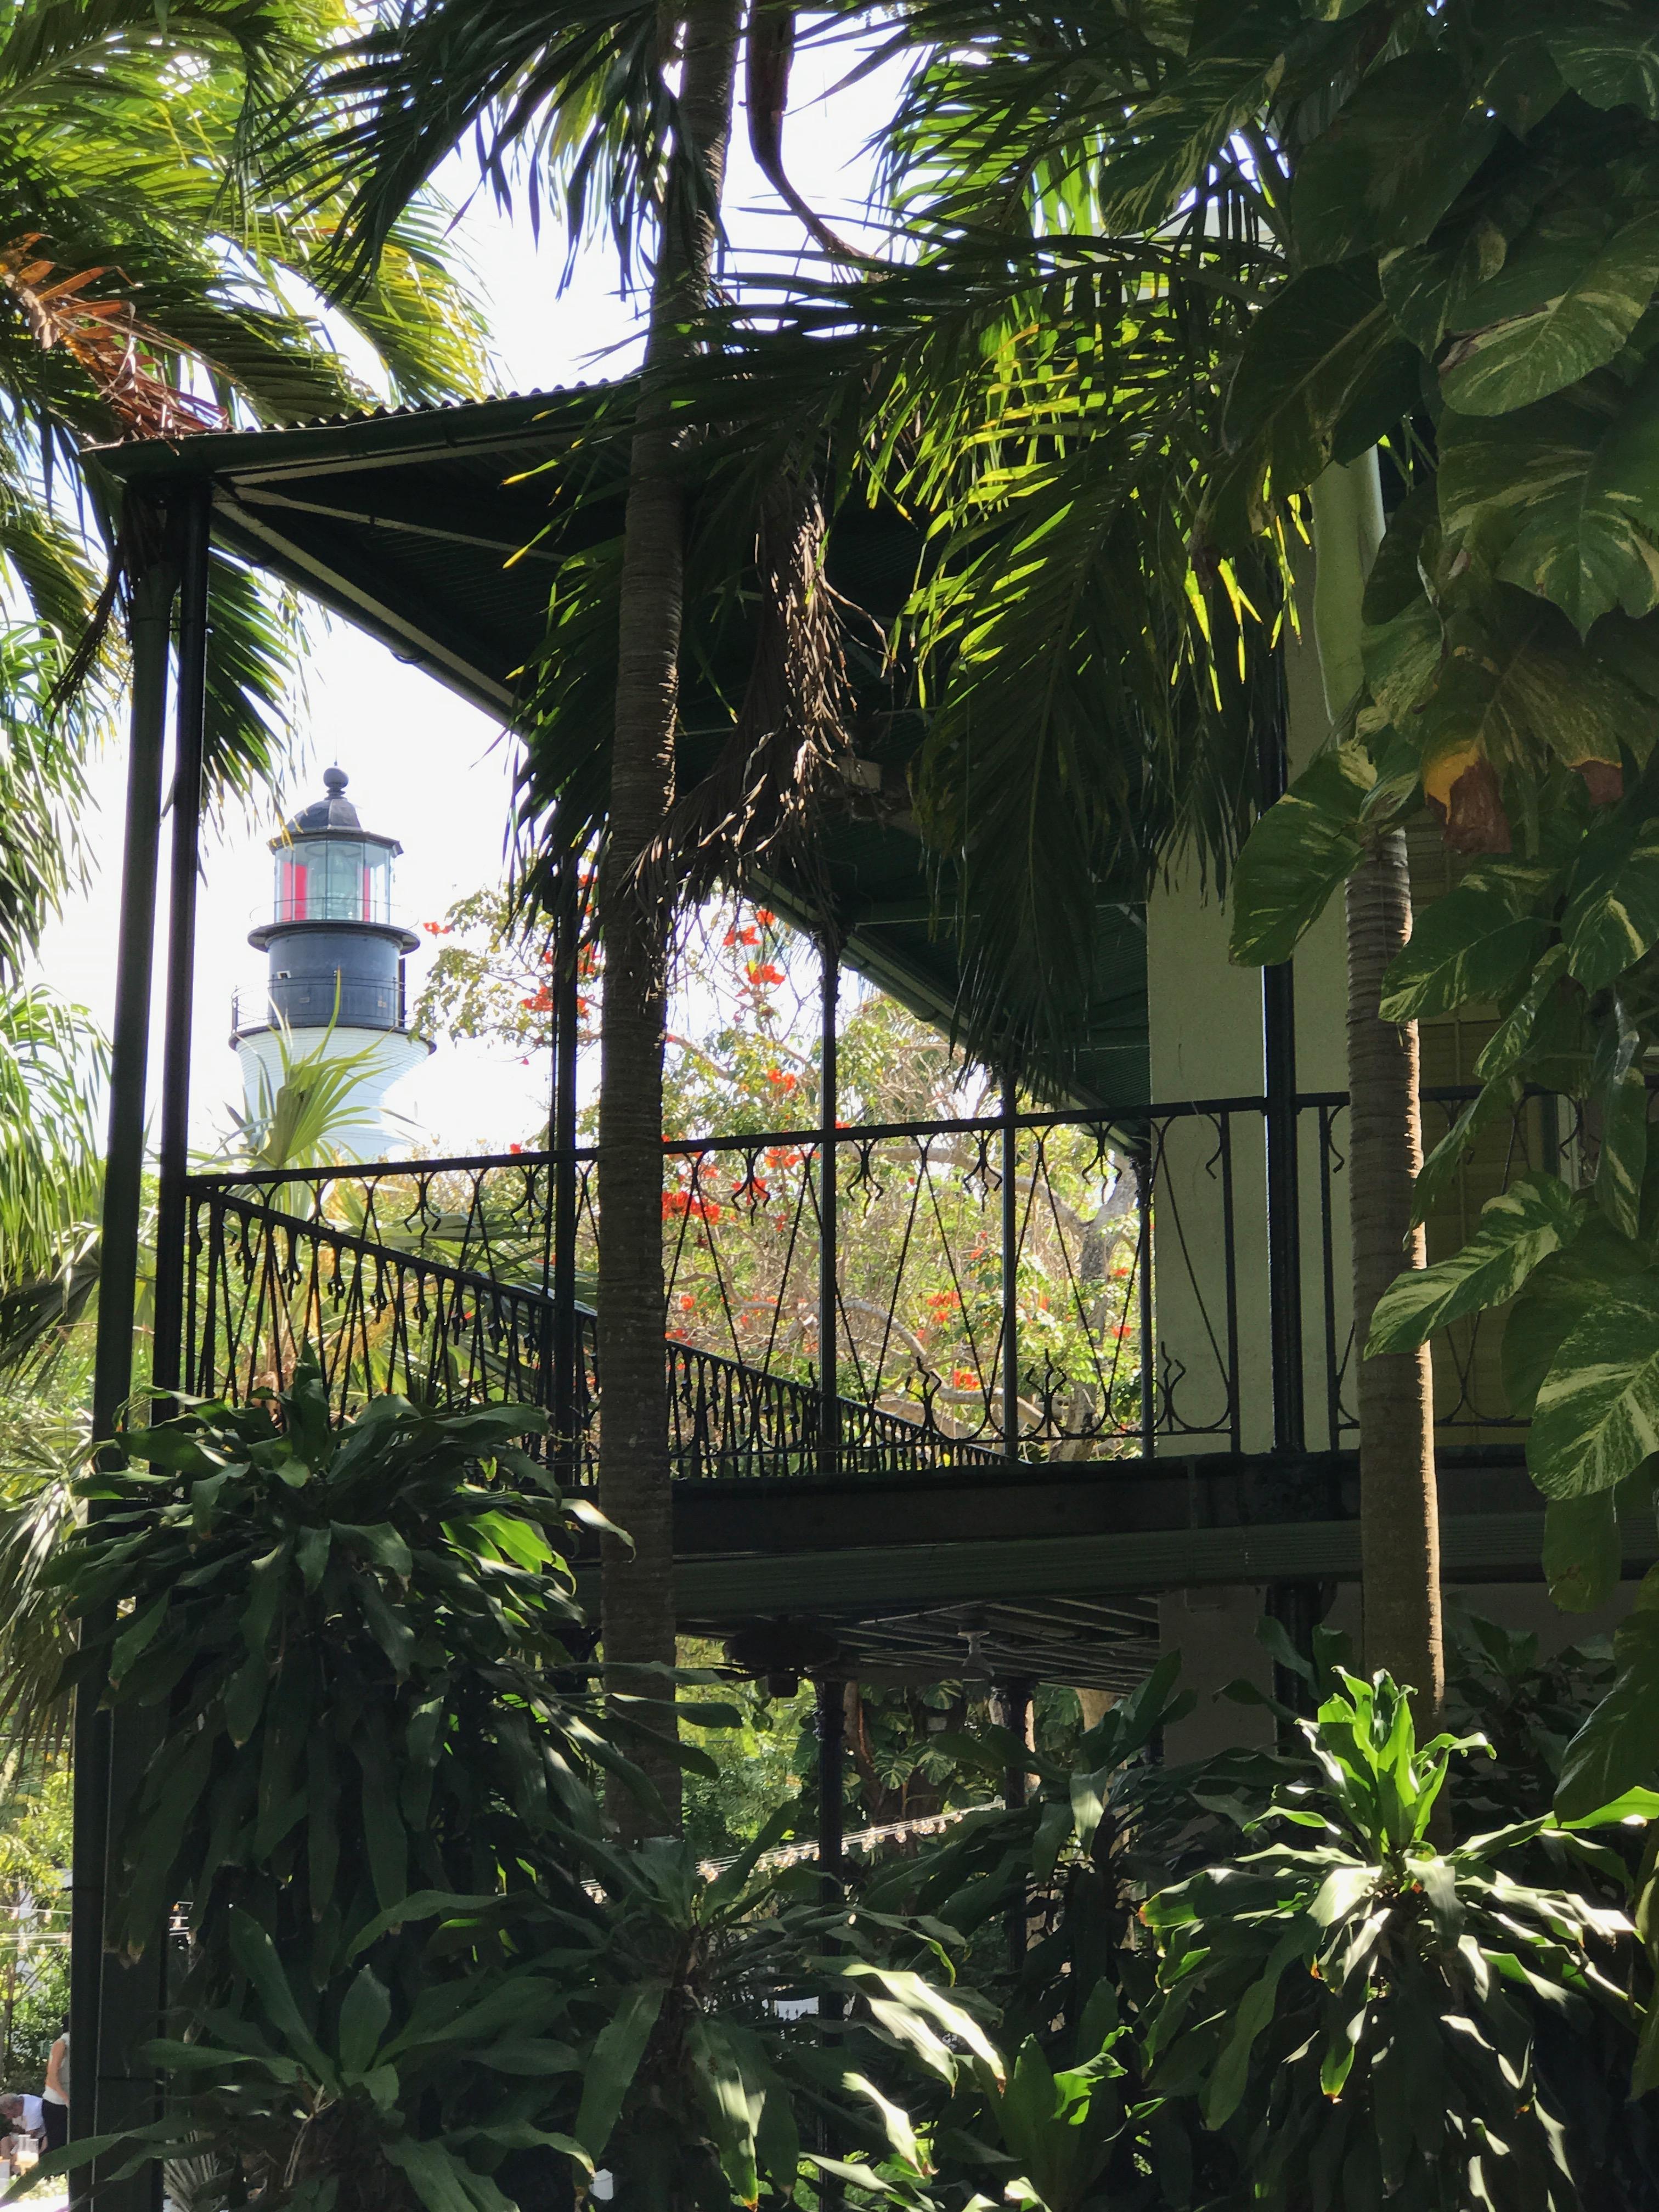 Ernest Hemingway's Key West Home